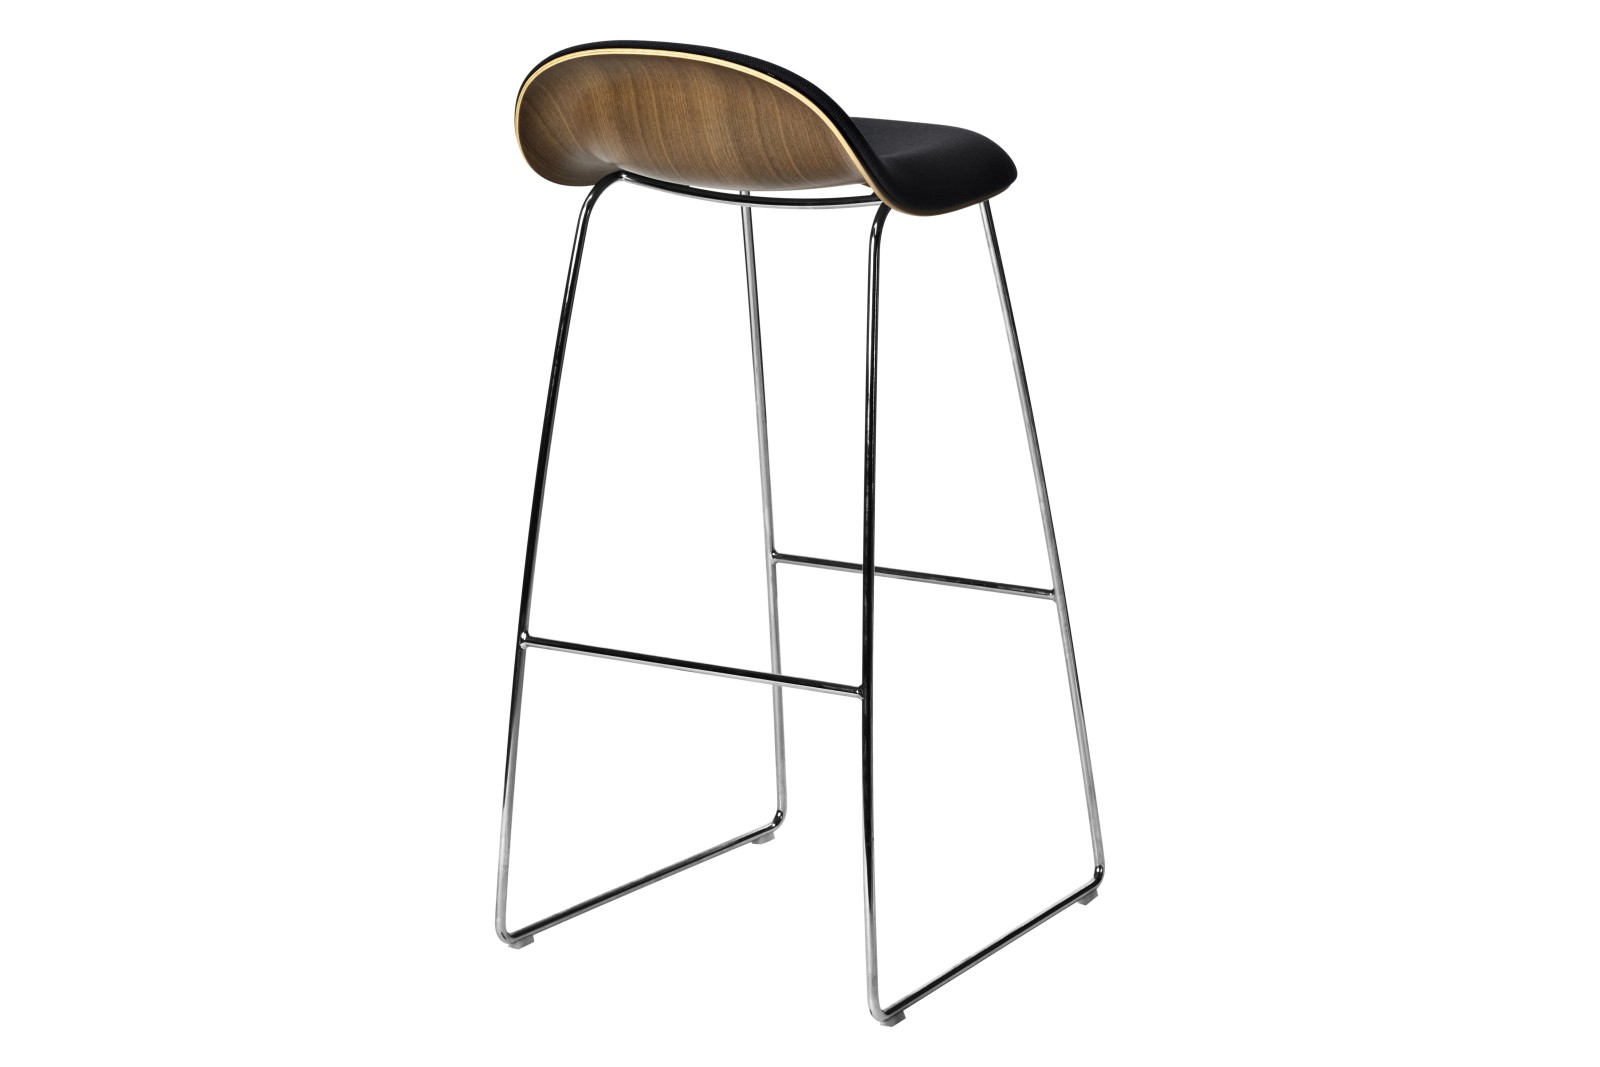 3D Bar Stool - Front Upholstered, Sledge base, Wood Shell Gubi Metal Chrome, Gubi Wood American Waln